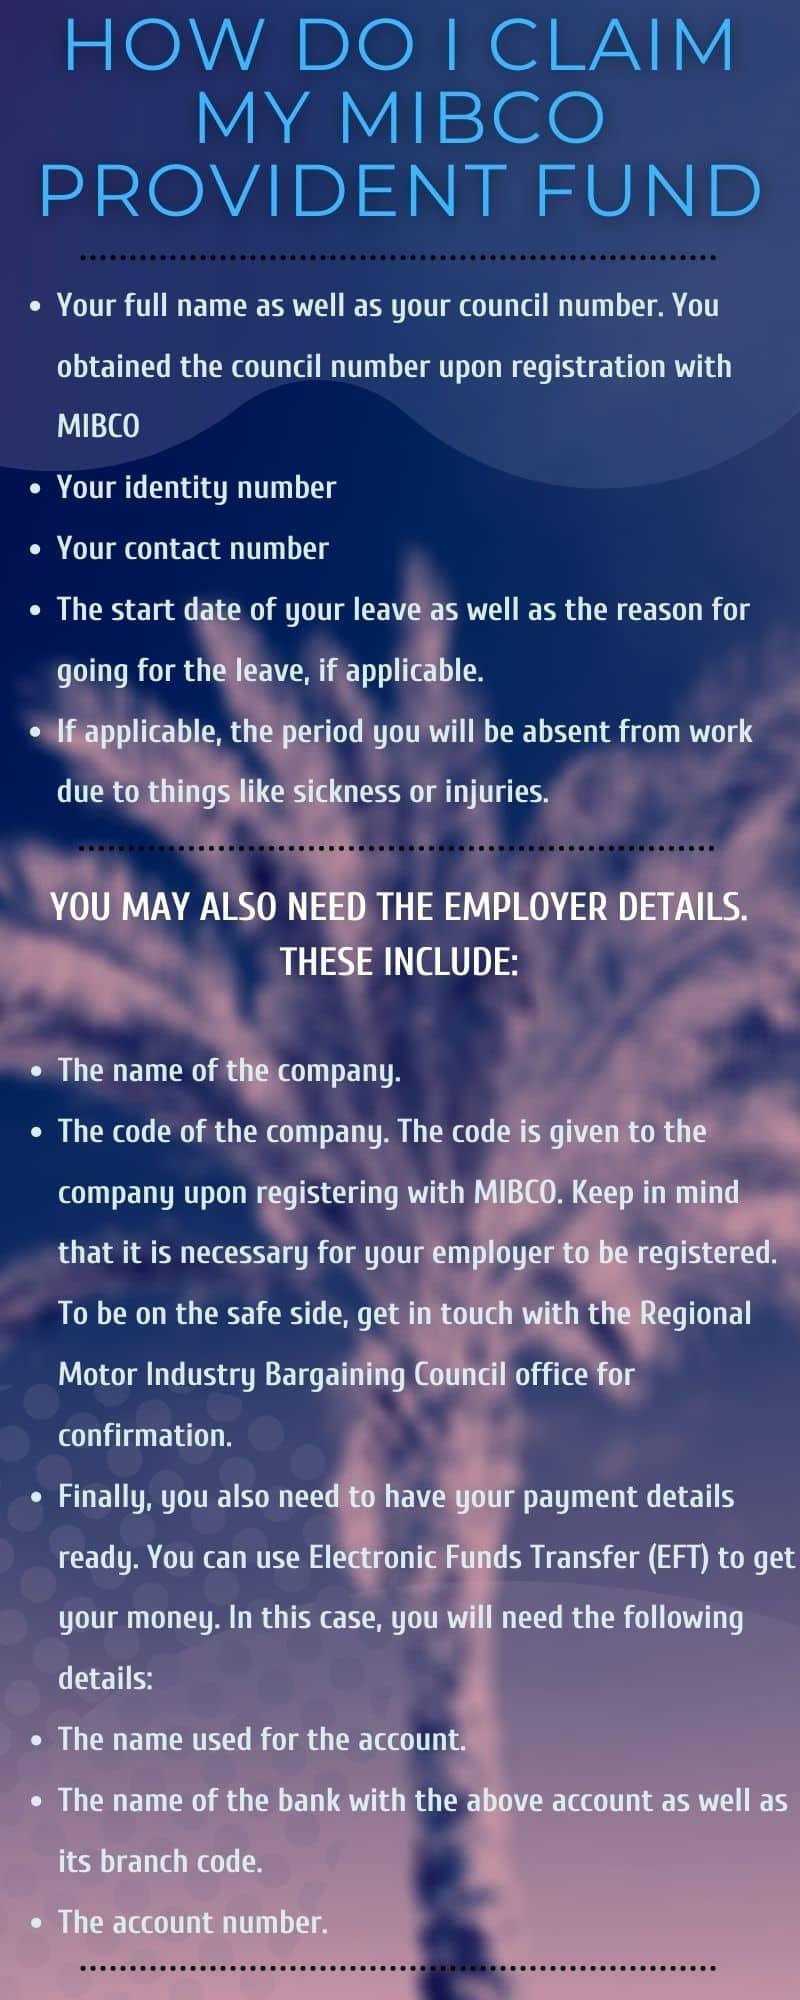 How do I claim my MIBCO provident fund